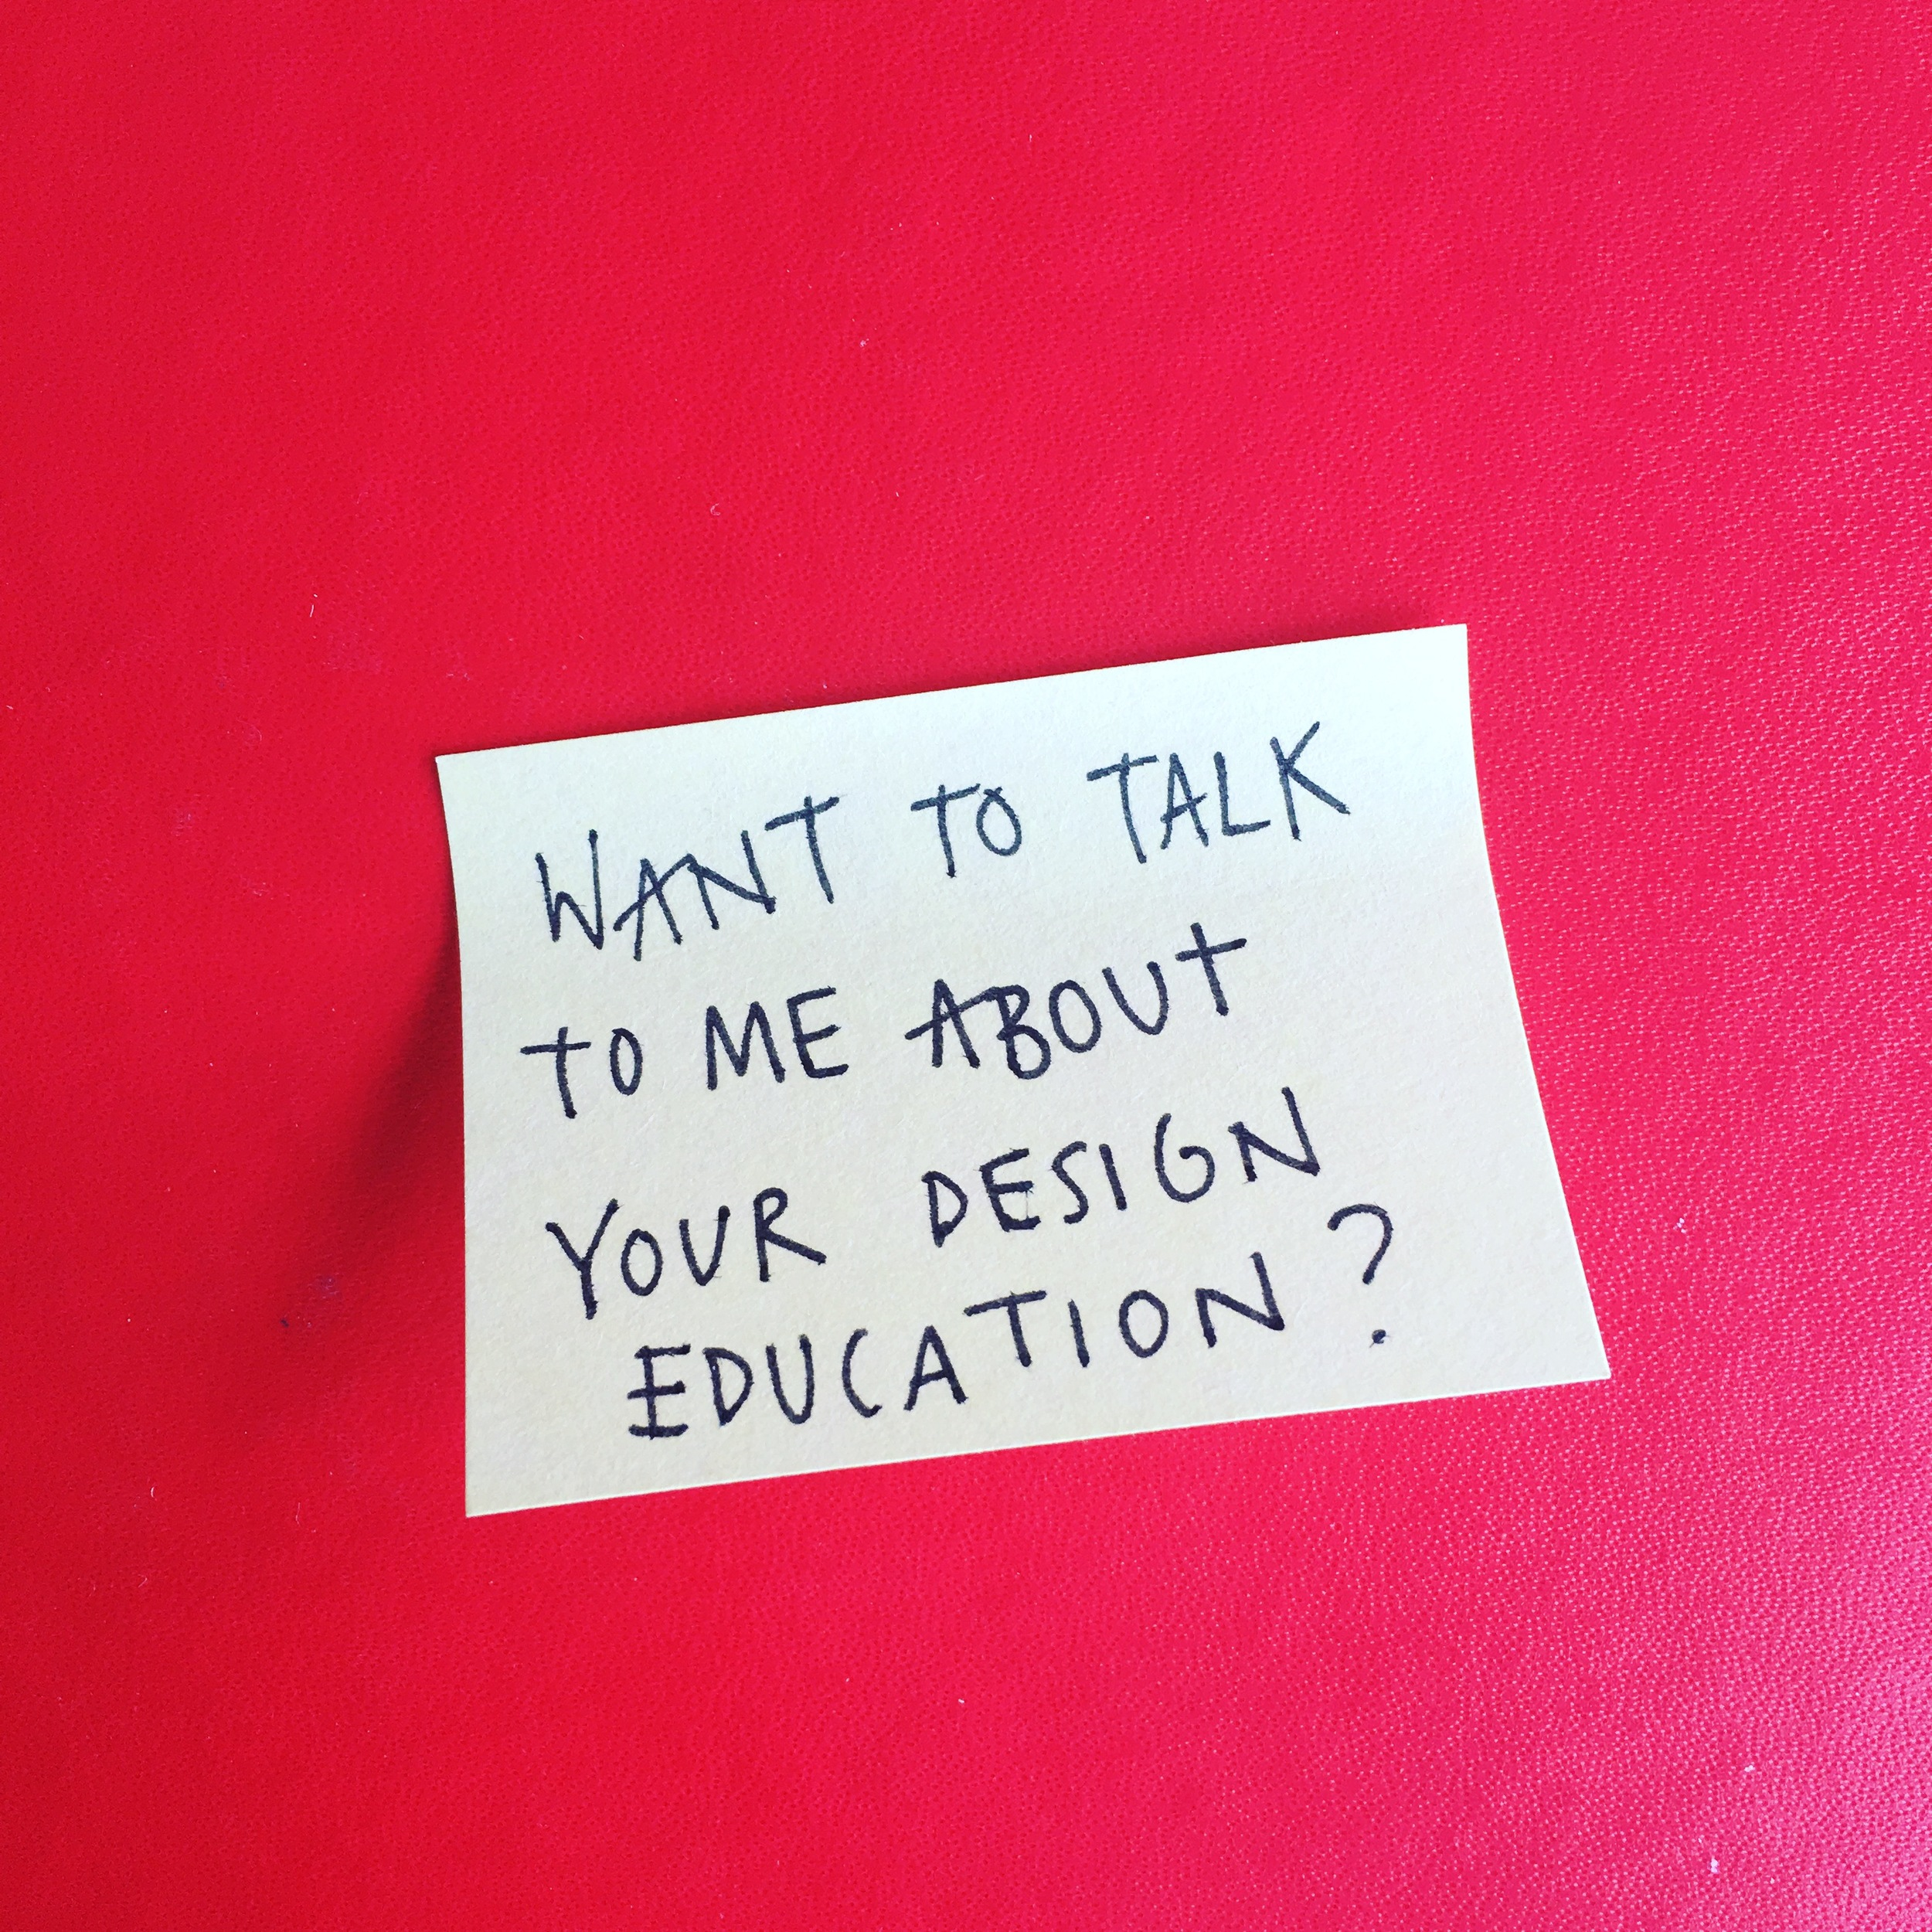 ixda_design_education_redjotter